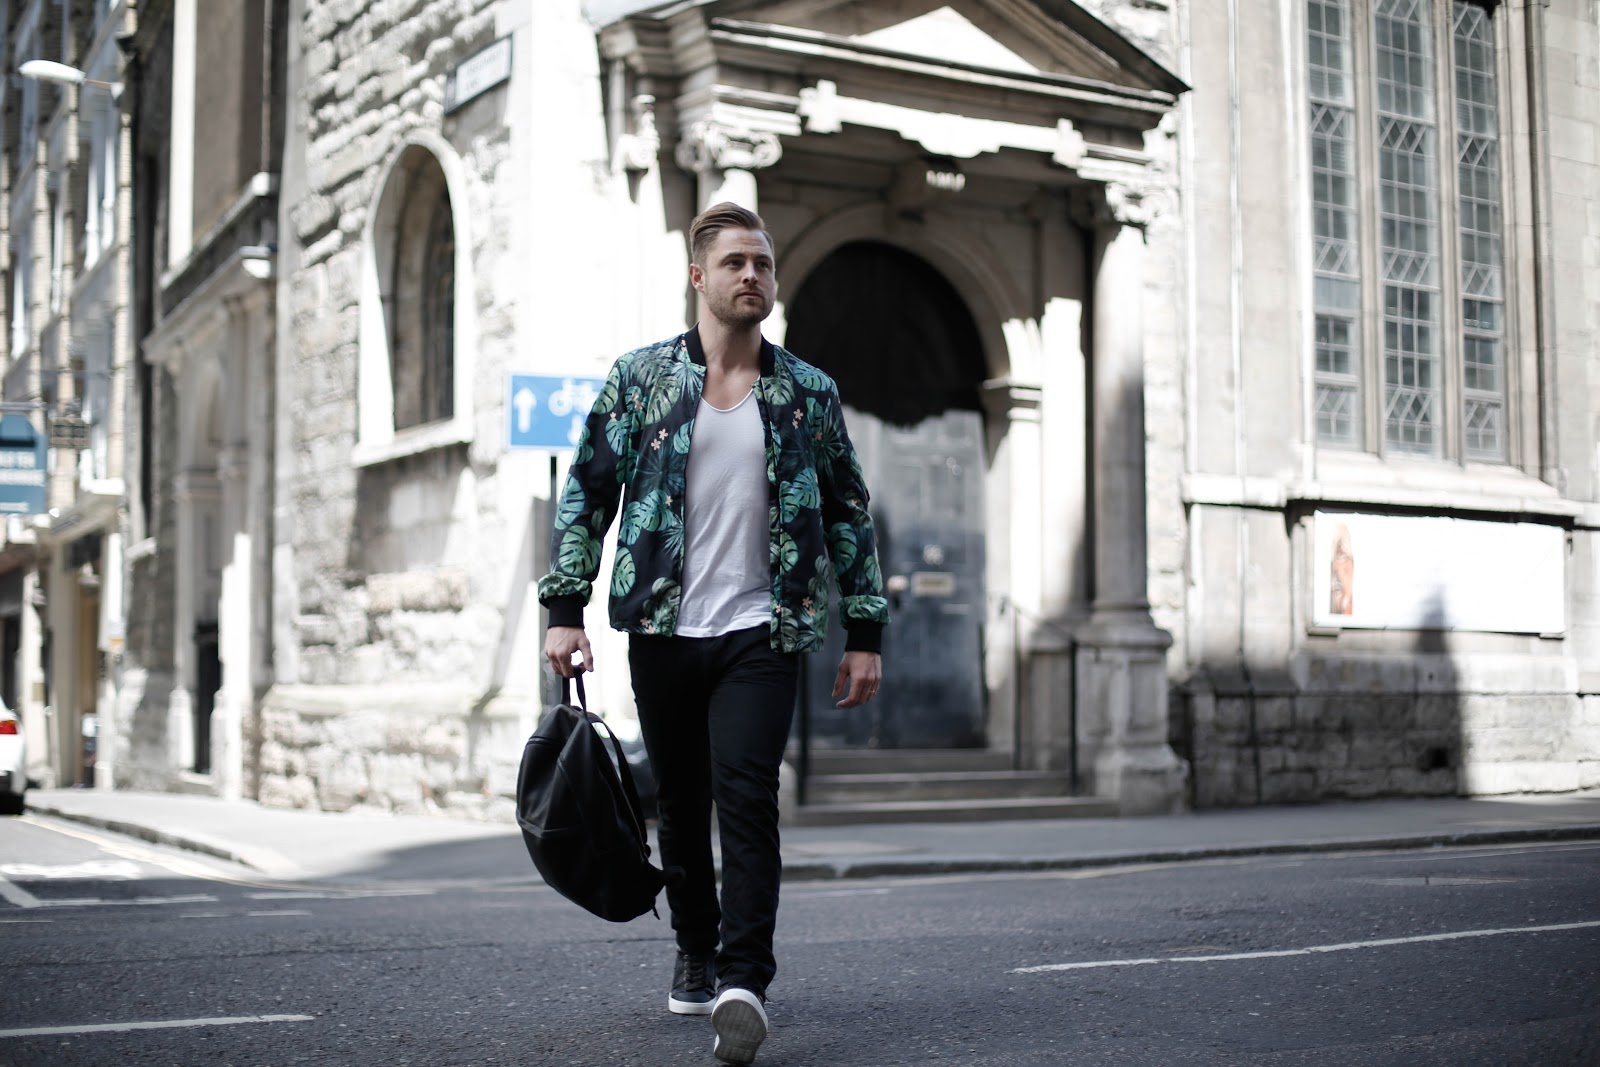 French Connection Sundowner Kurt Geiger Kurtis High Tops Linea Backpack all House of Fraser